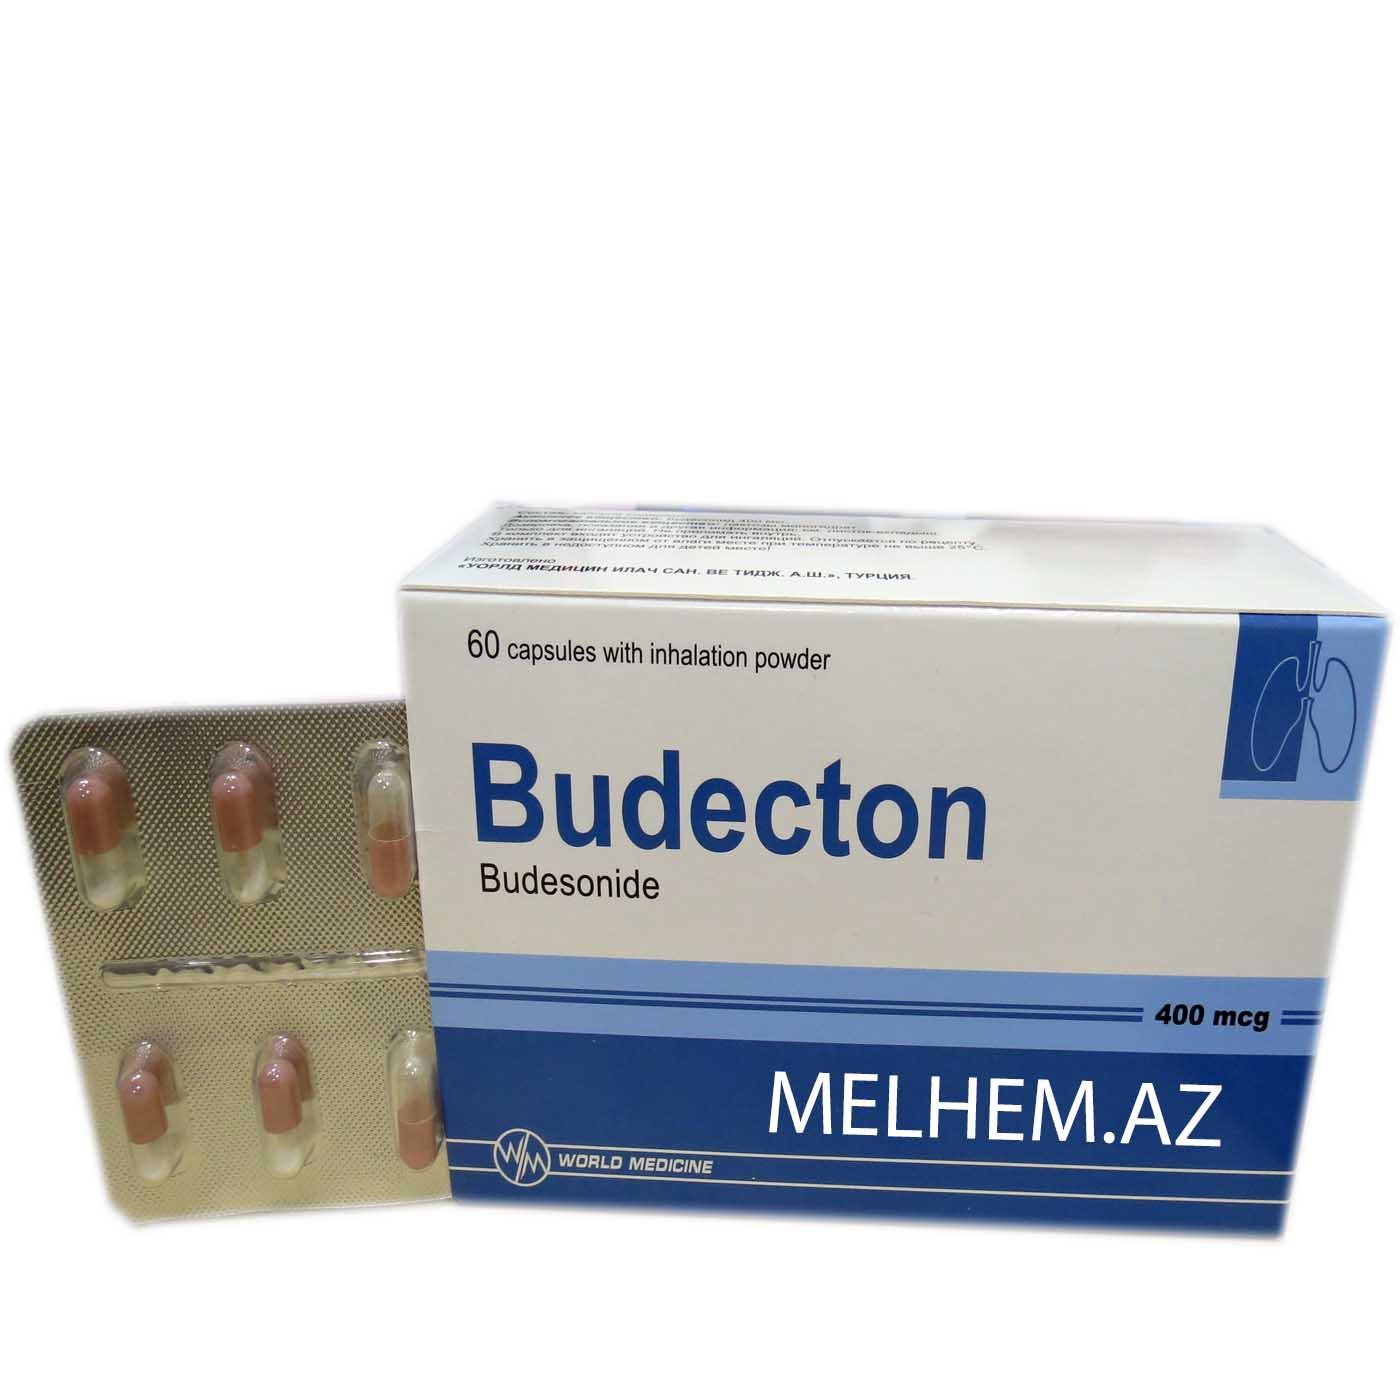 BUDEKTON